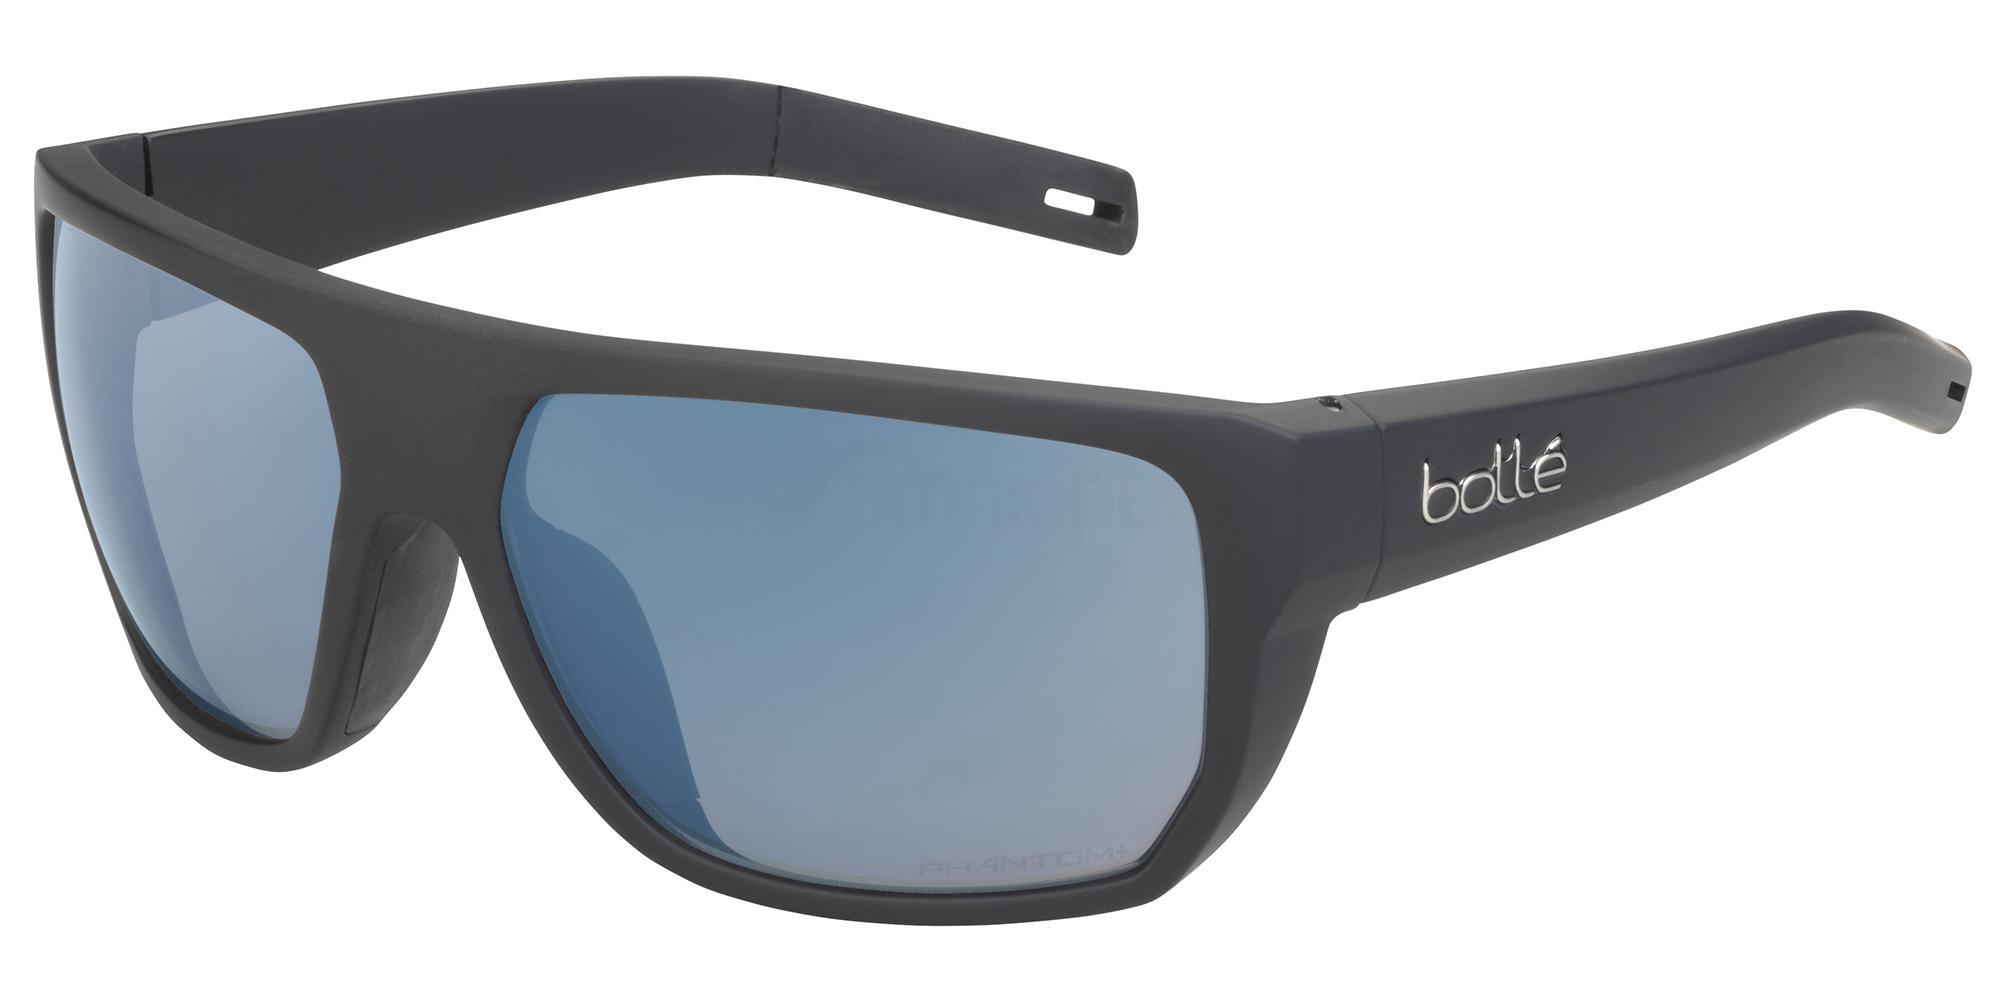 12662 VULTURE Sunglasses, Bolle